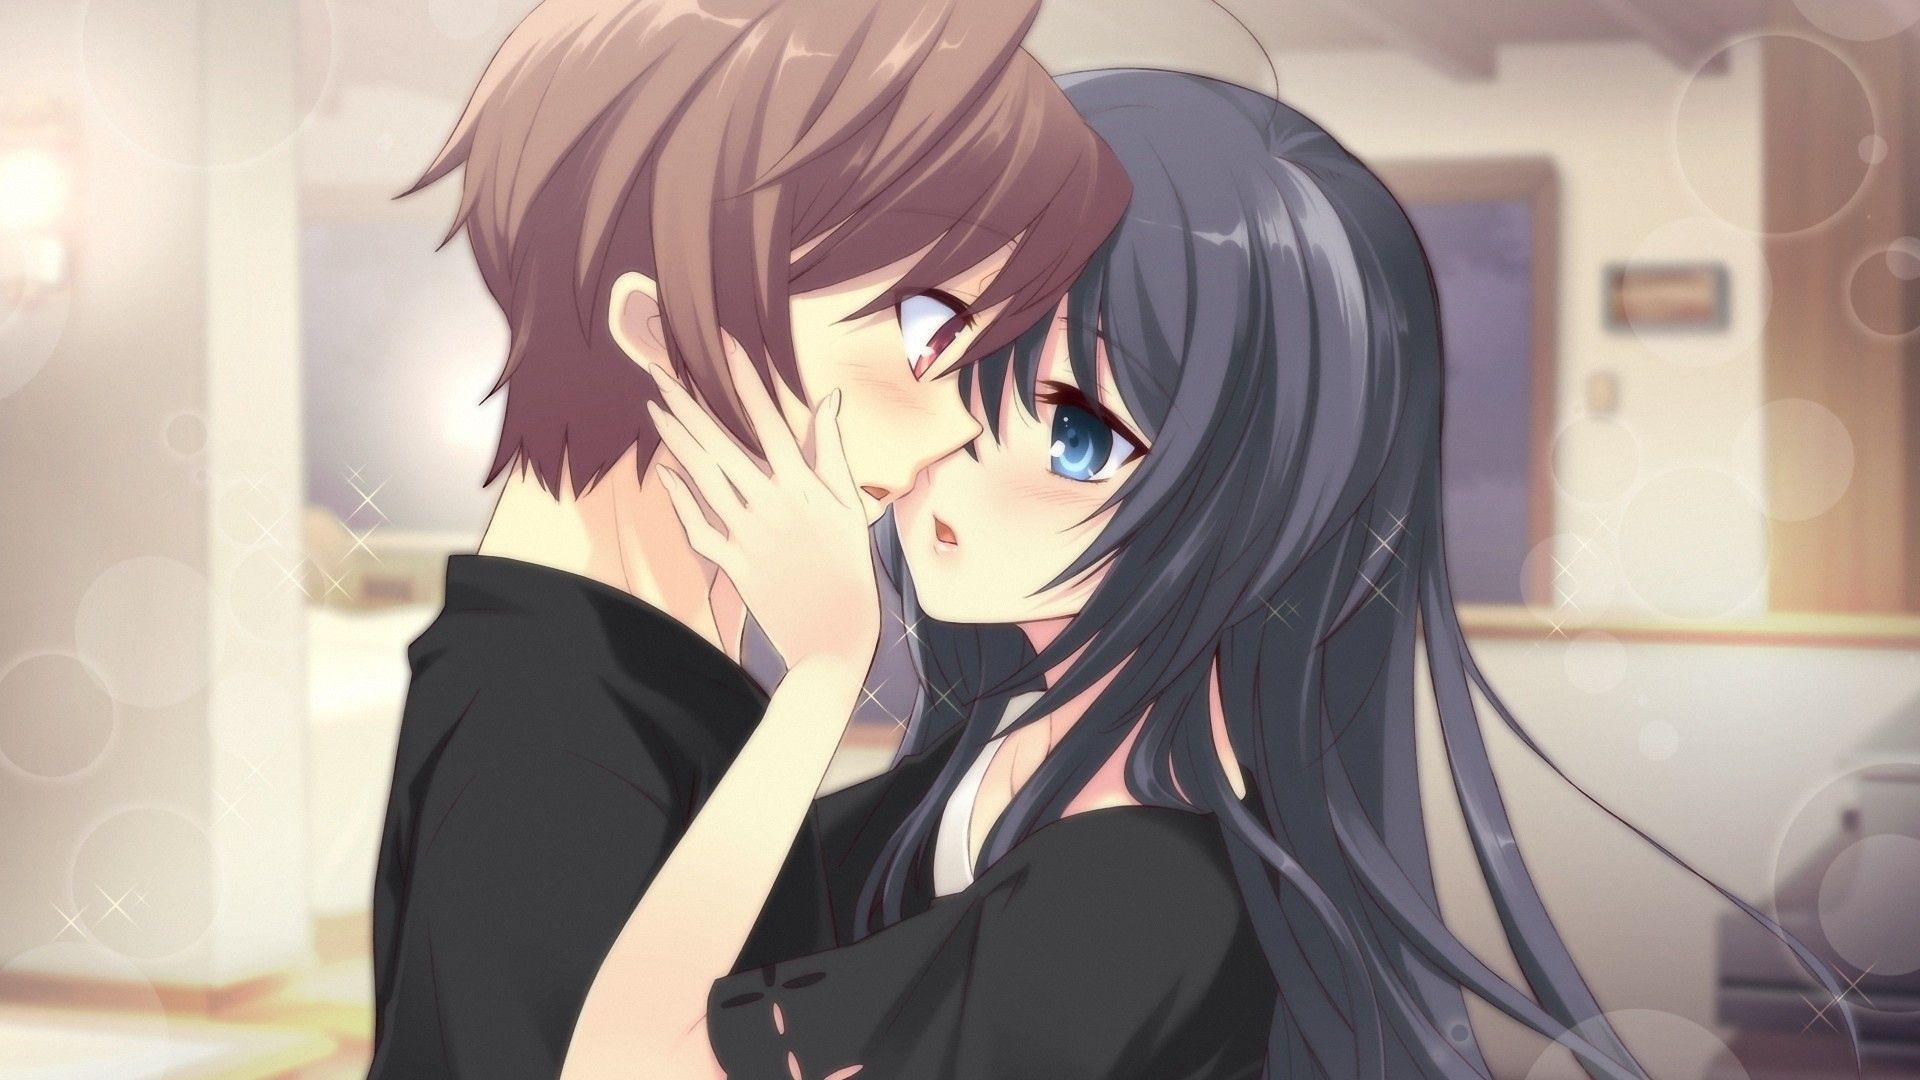 Unduh 920 Koleksi Couple Wallpaper Anime Hd Iphone Terbaik